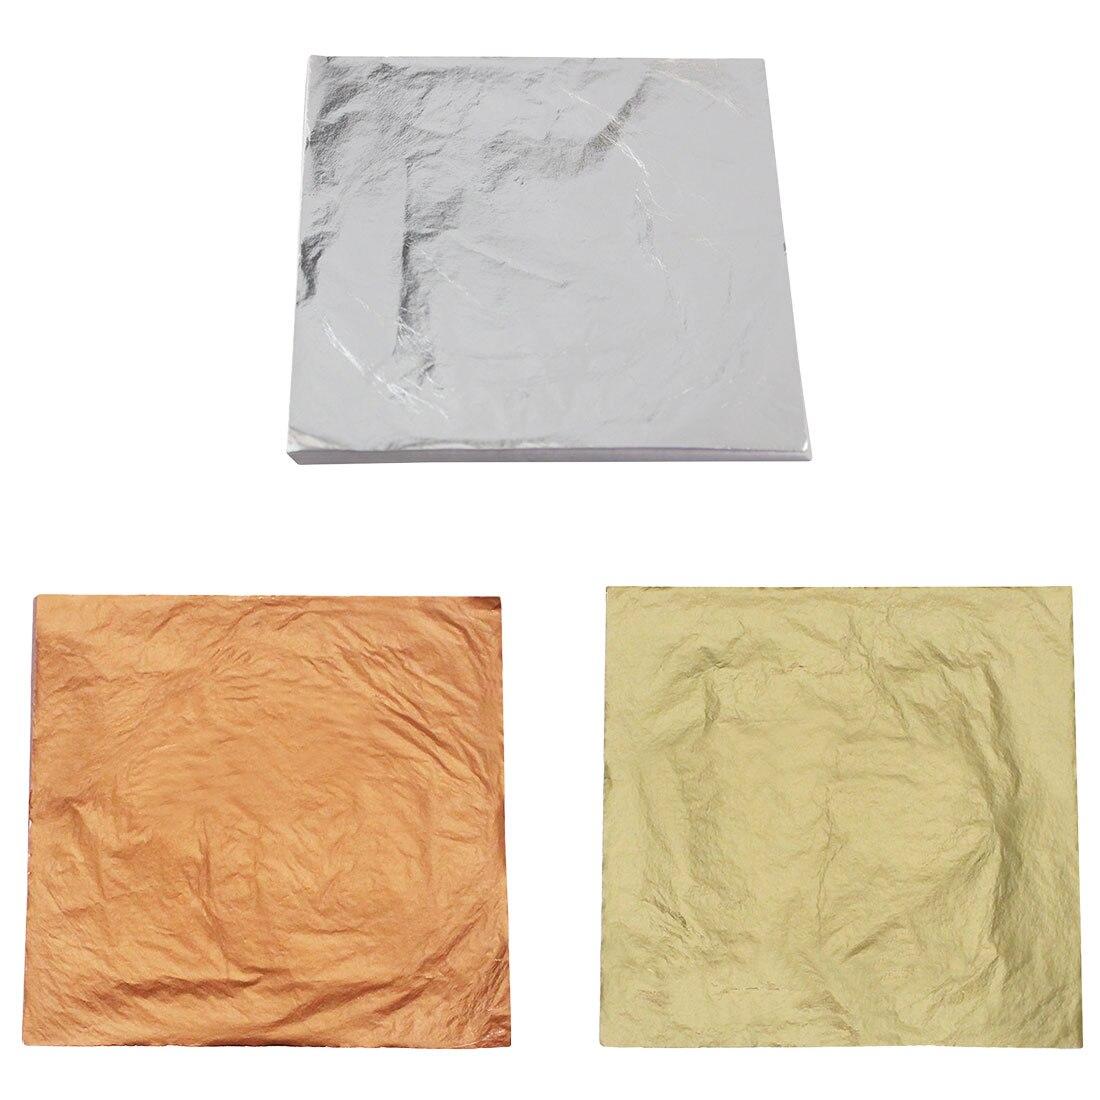 100 Pcs 14x14cm Gold//Silver//Copper Leaf Sheets Leaves Sheets Gilding Art Craft